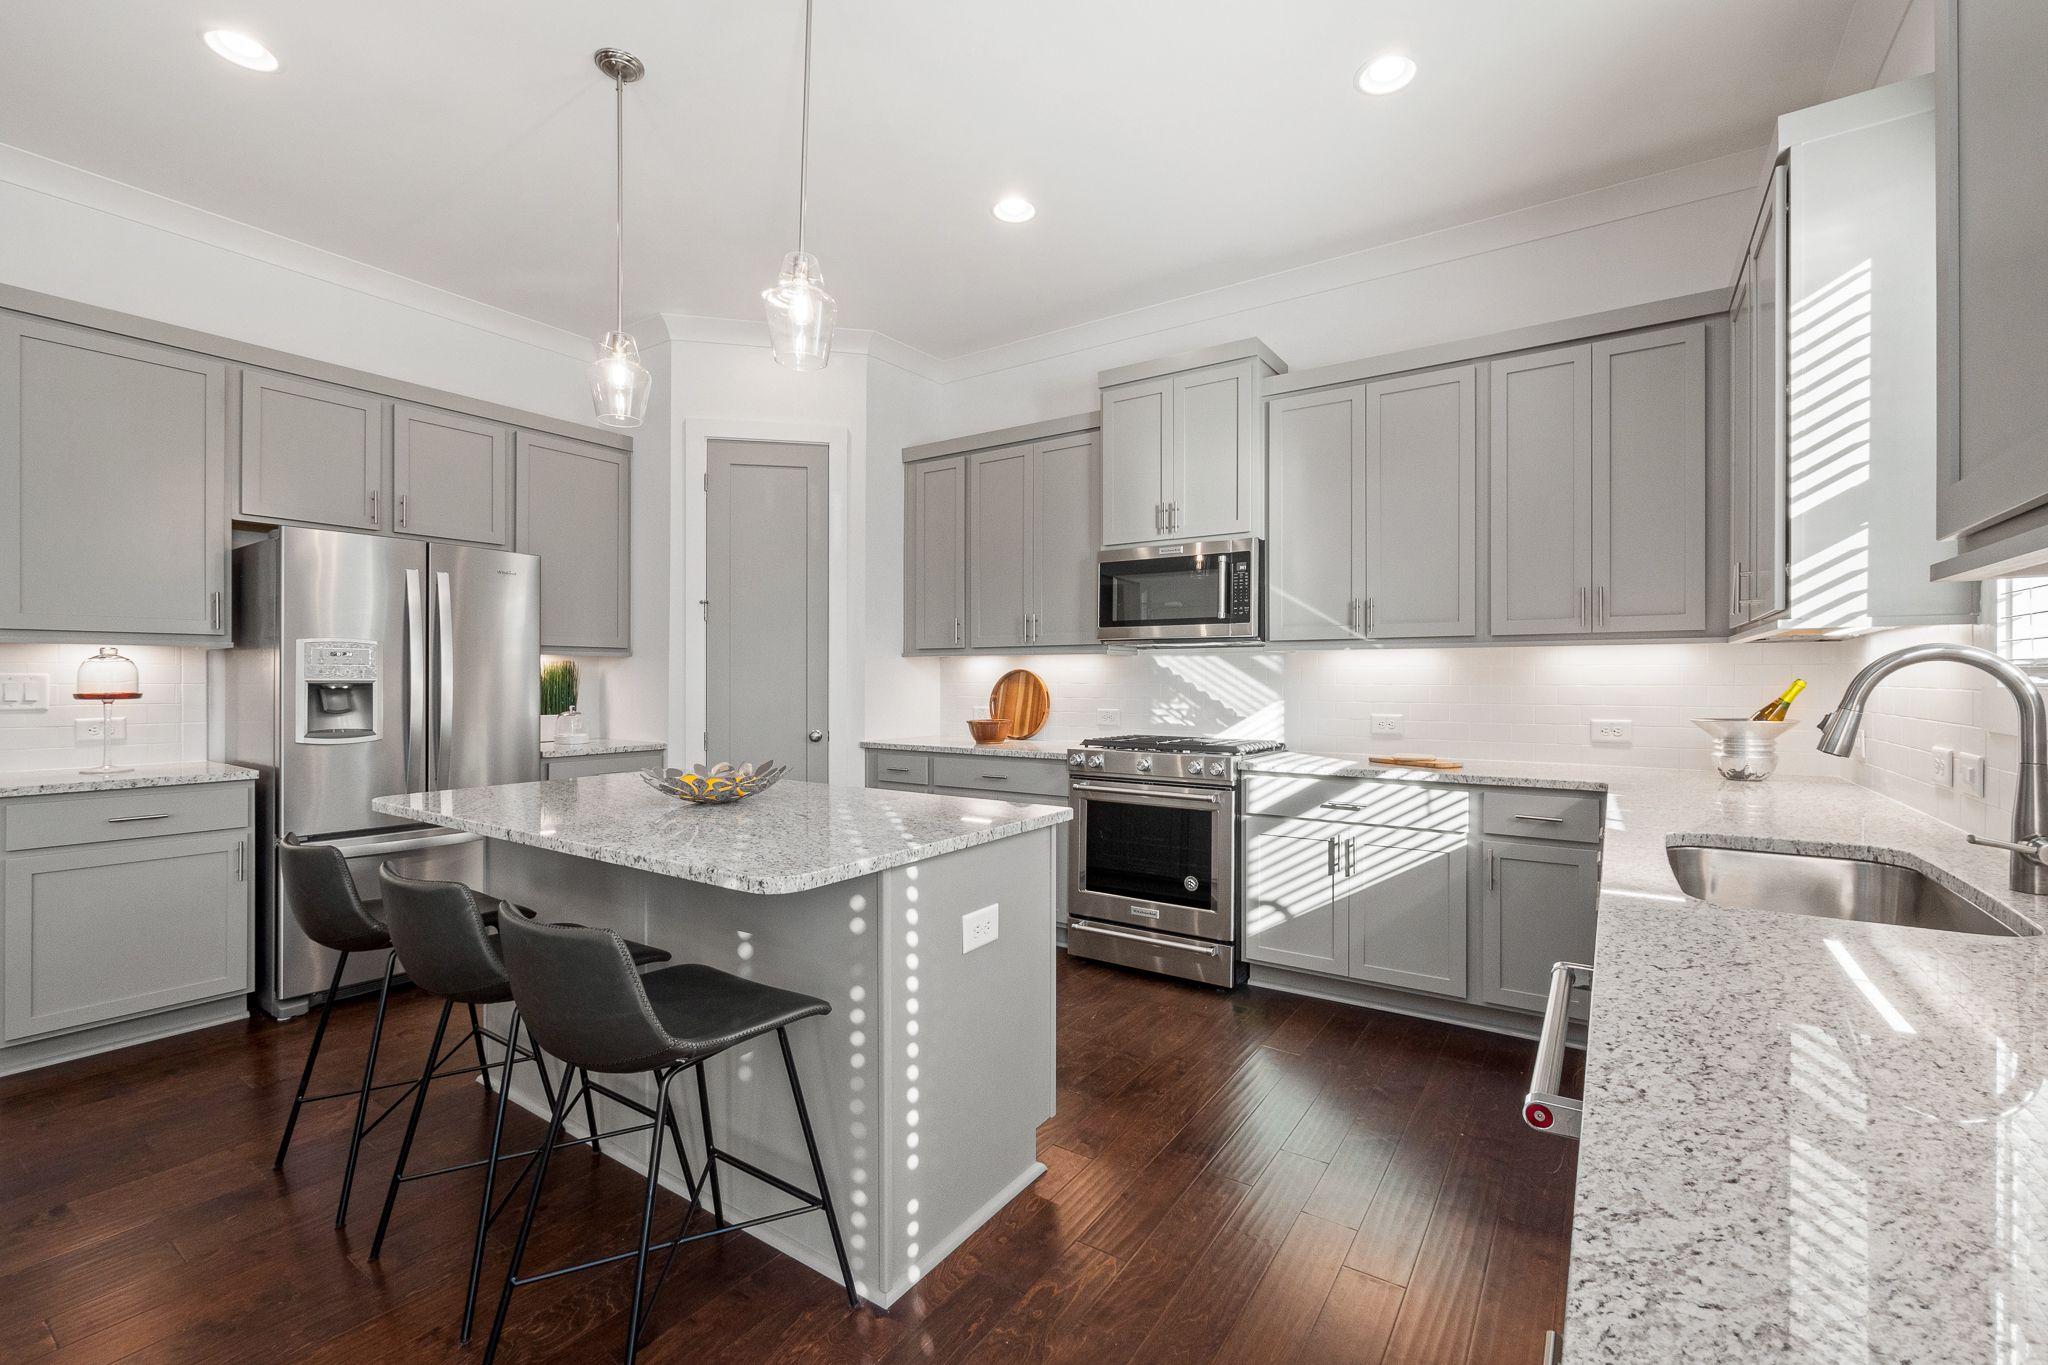 Kitchen featured in the Abbott By Minerva Homes in Atlanta, GA